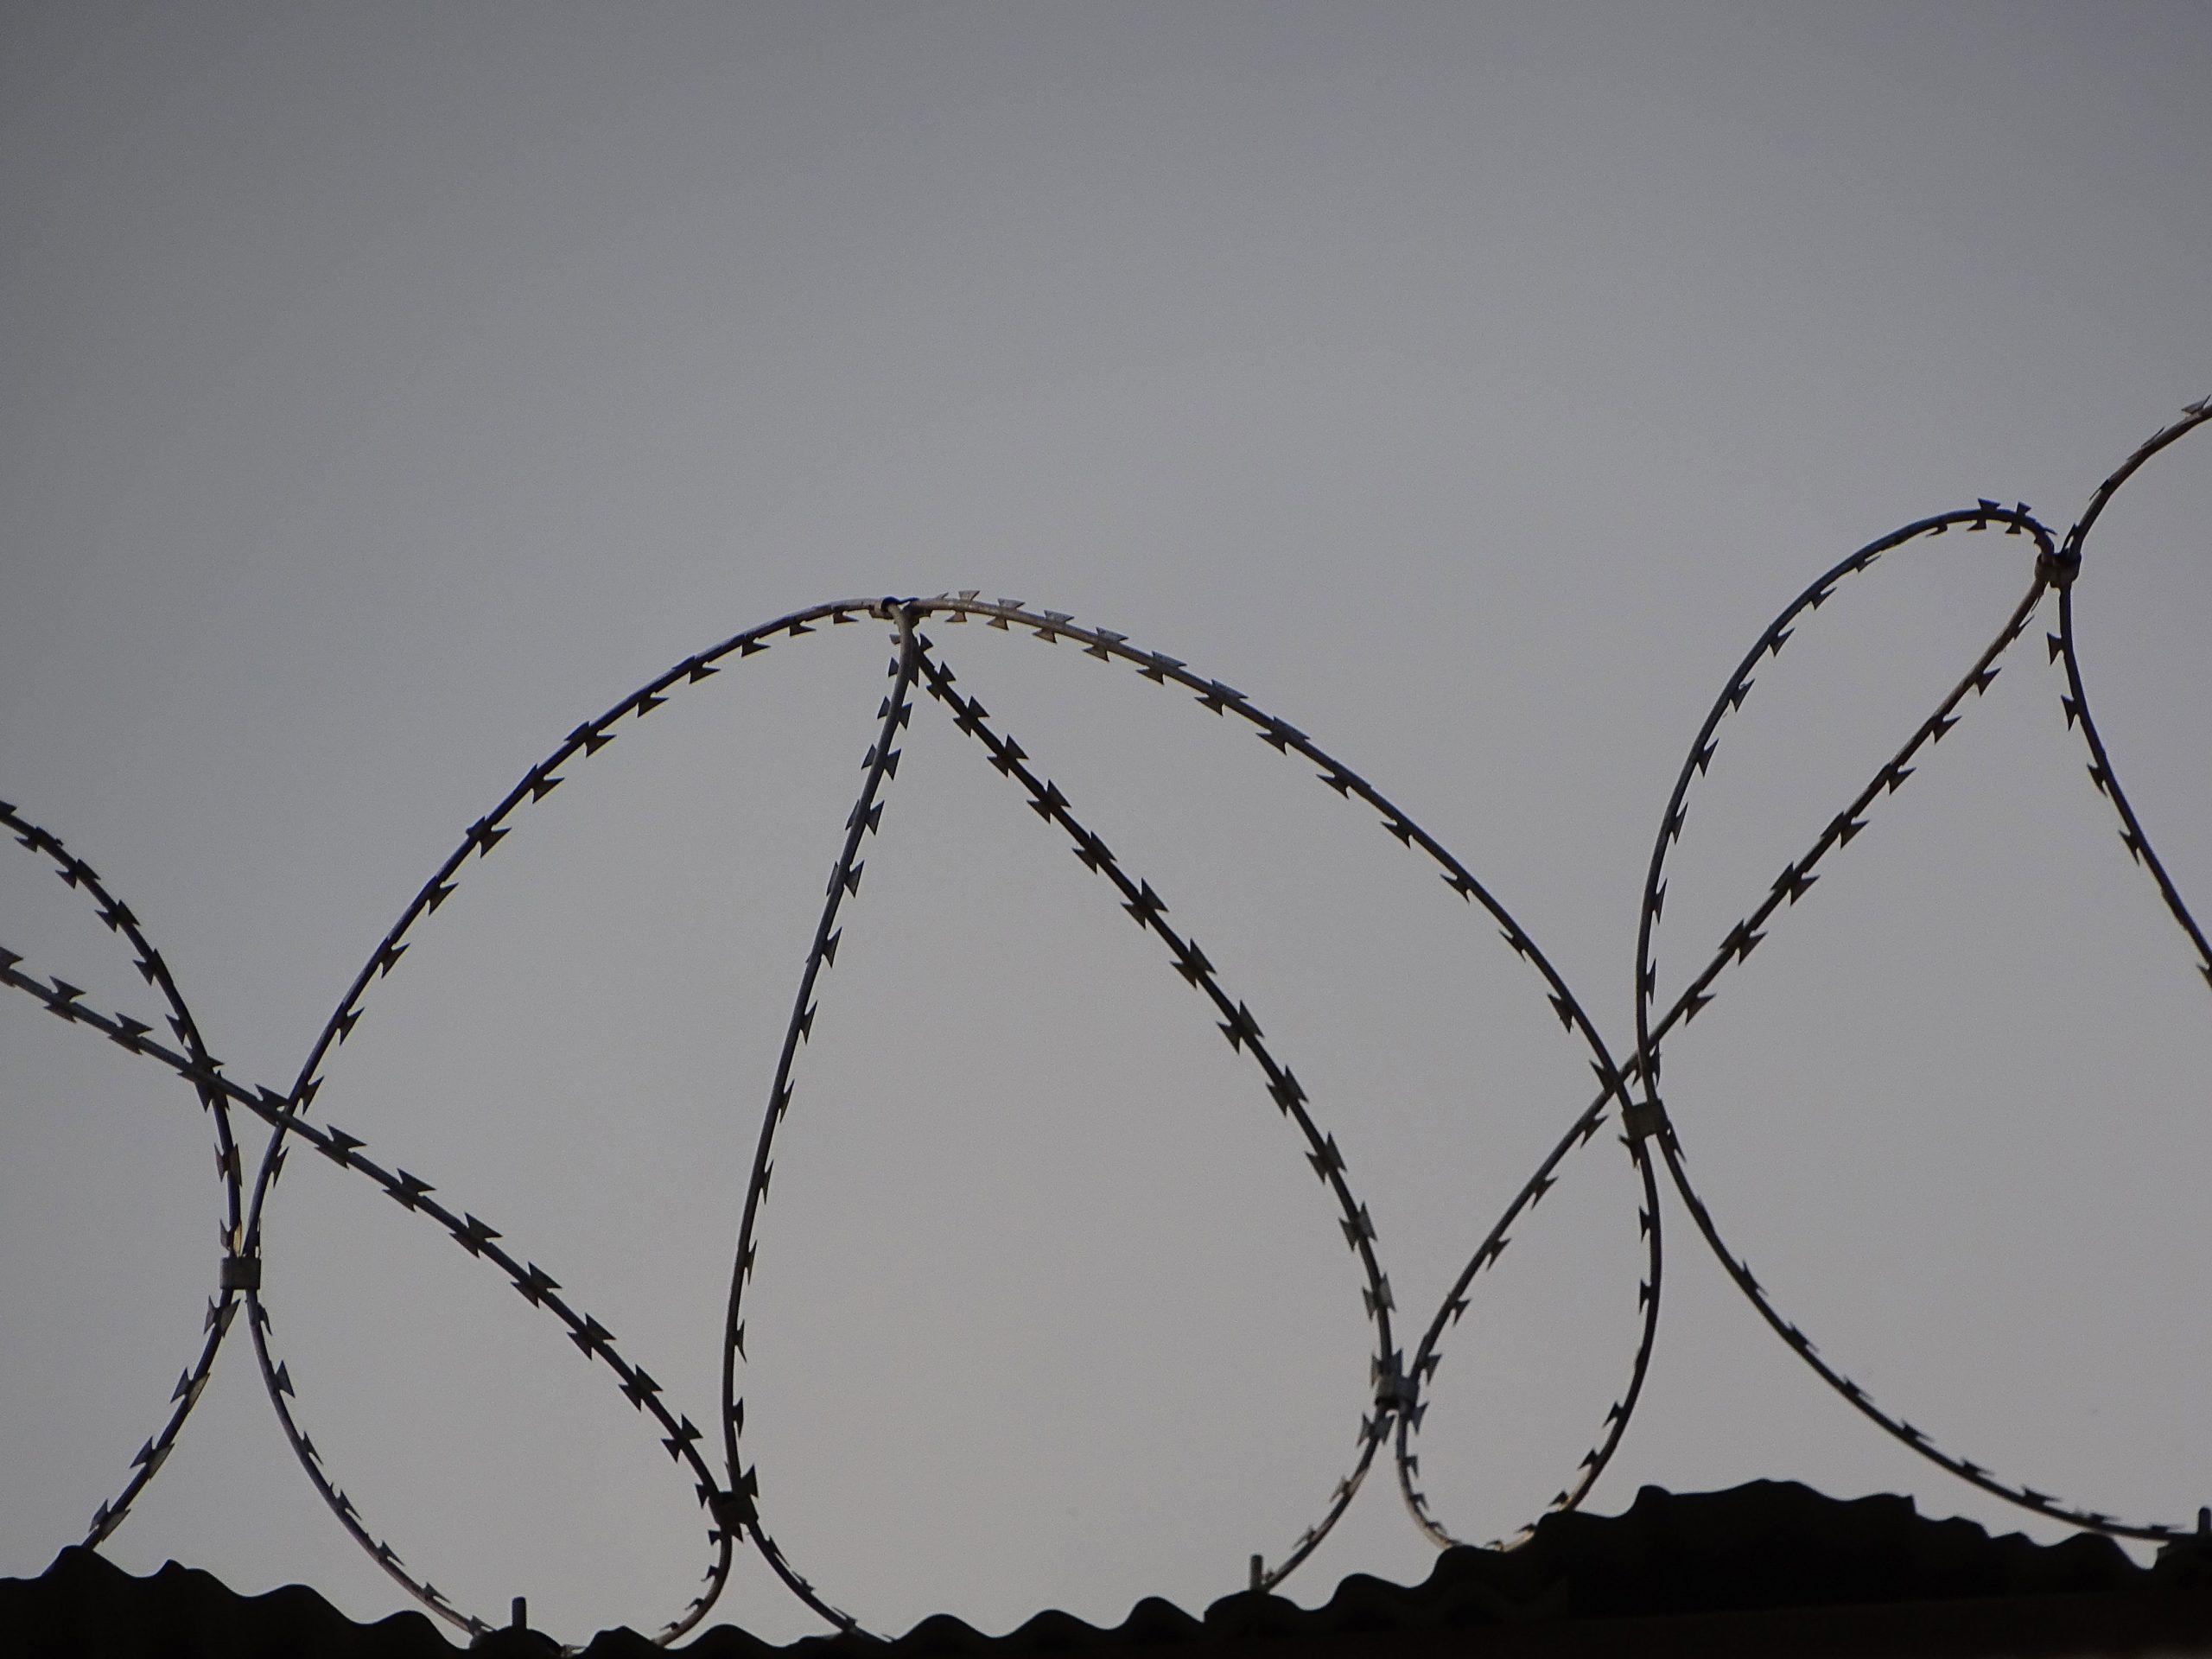 Arbitrary Detention of Journalists in Vietnam